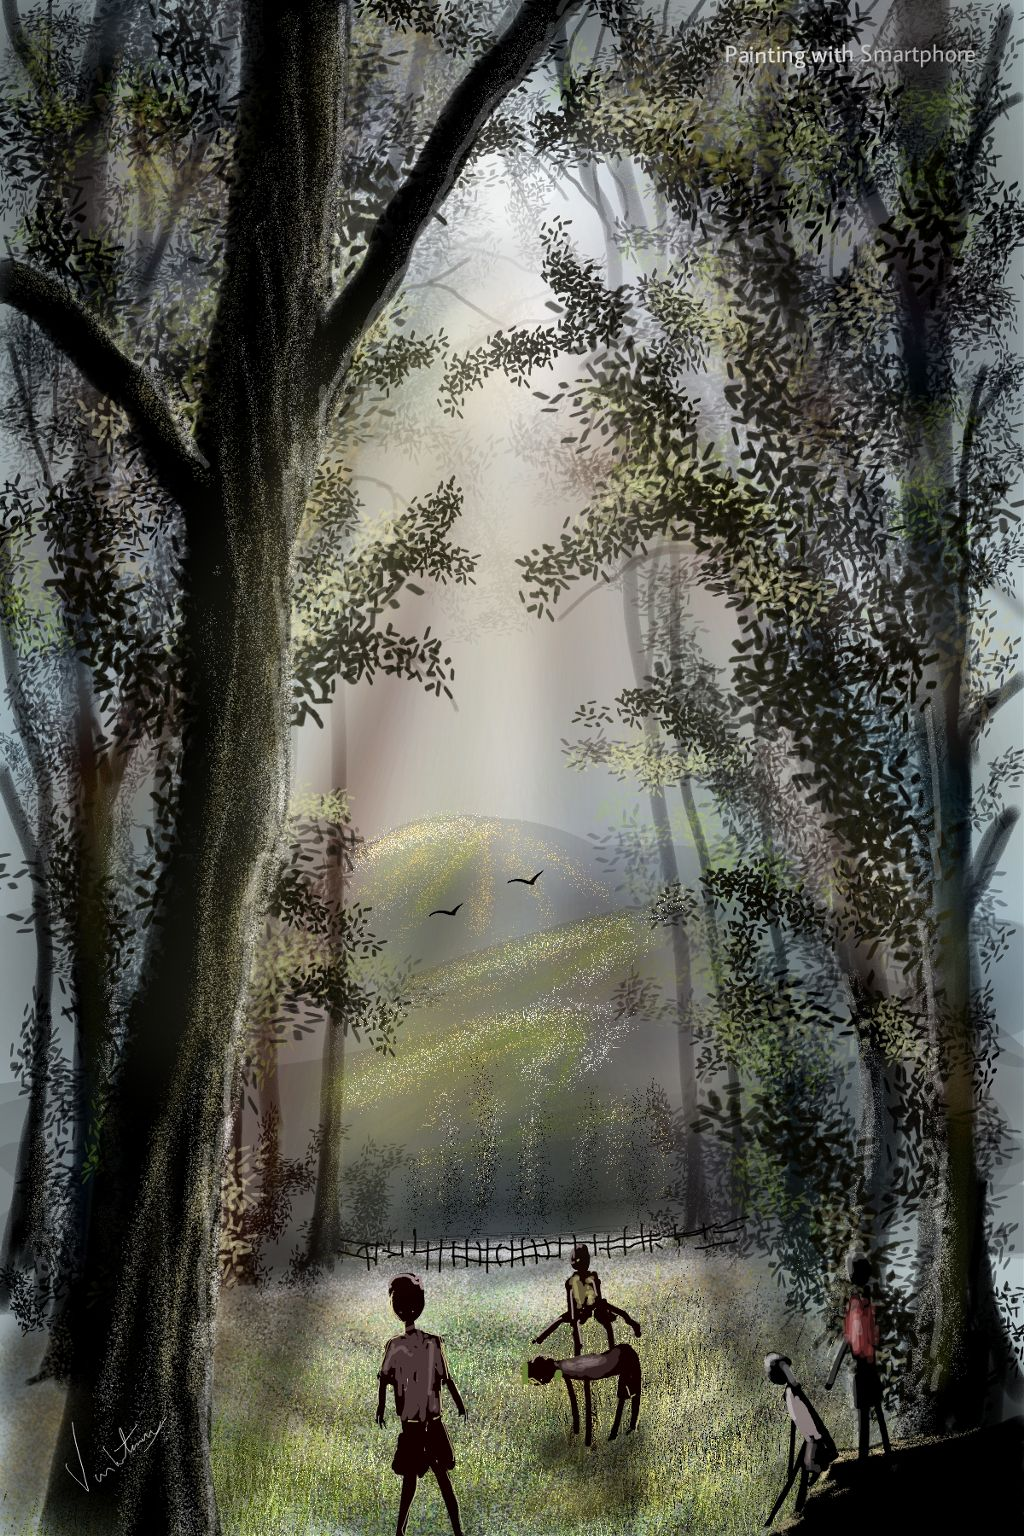 #drawing #share #true #love #enjoy #nature #life